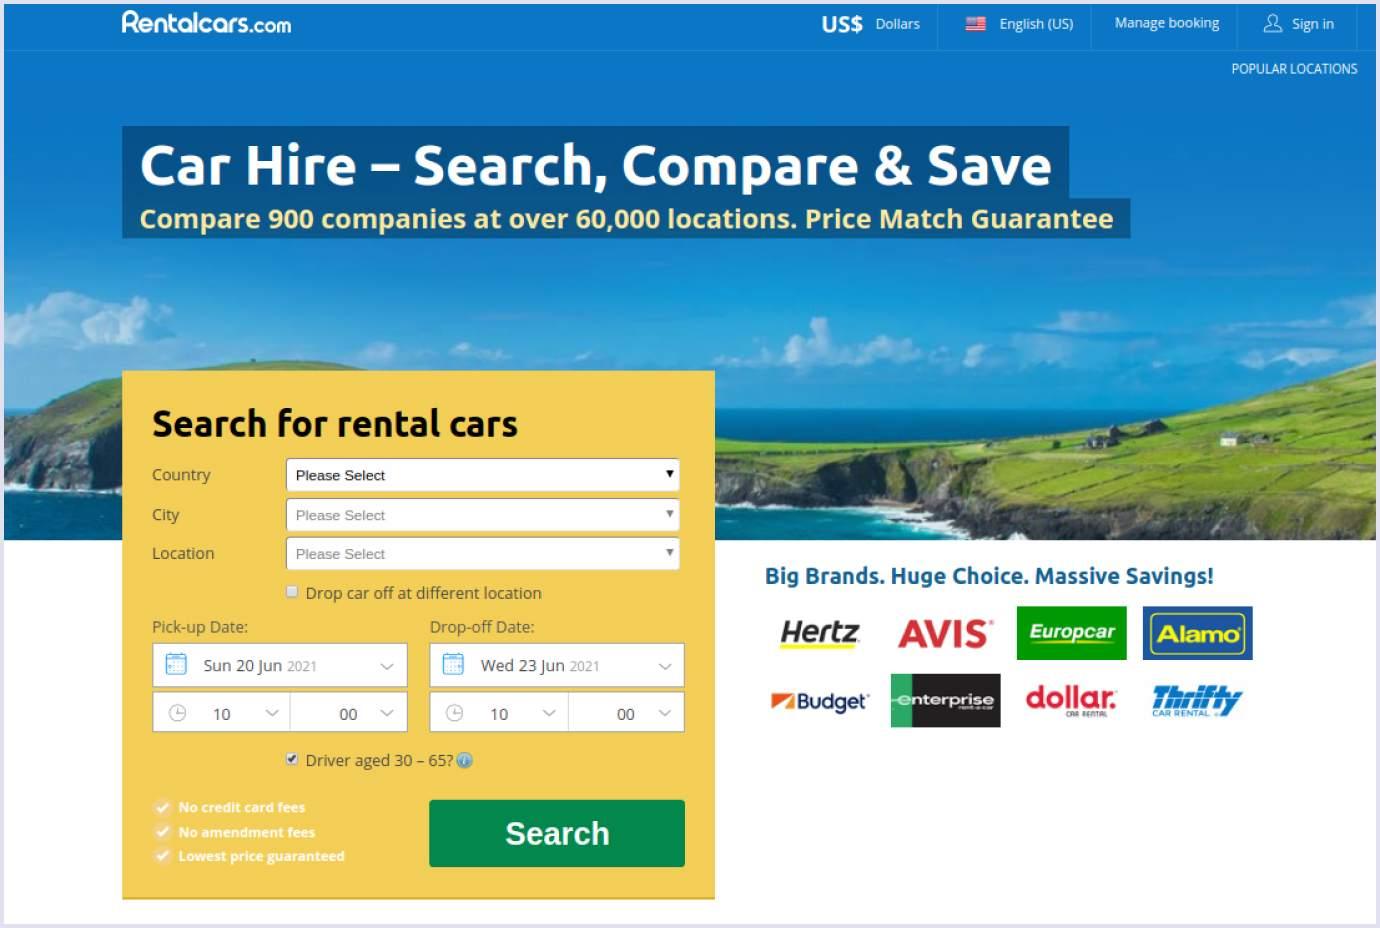 Home page of car rental website Rentalcars